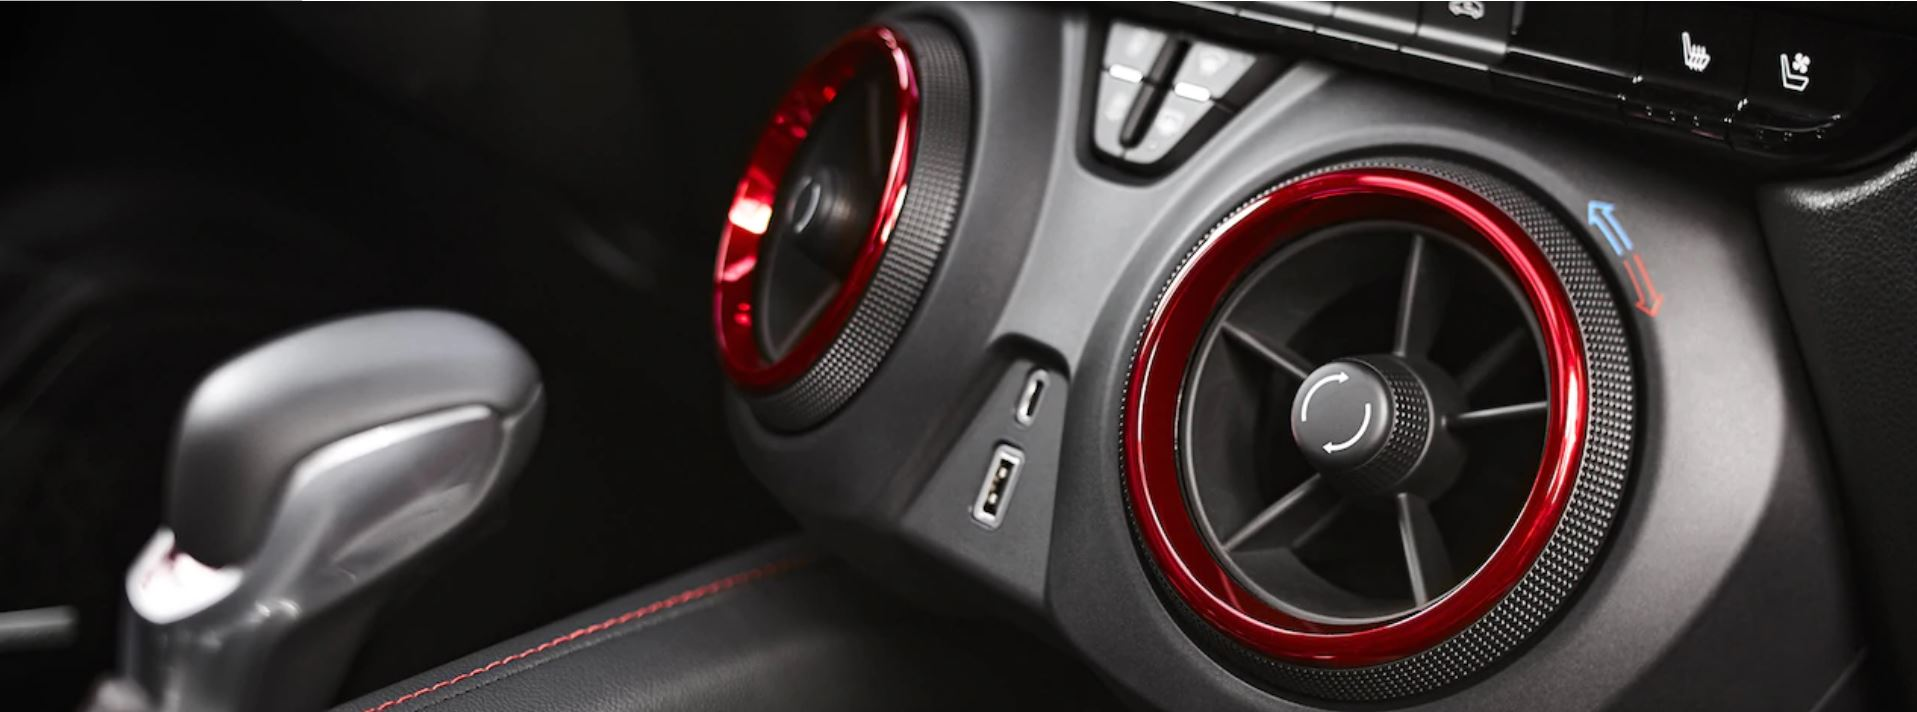 2019 Chevrolet Blazer Interior